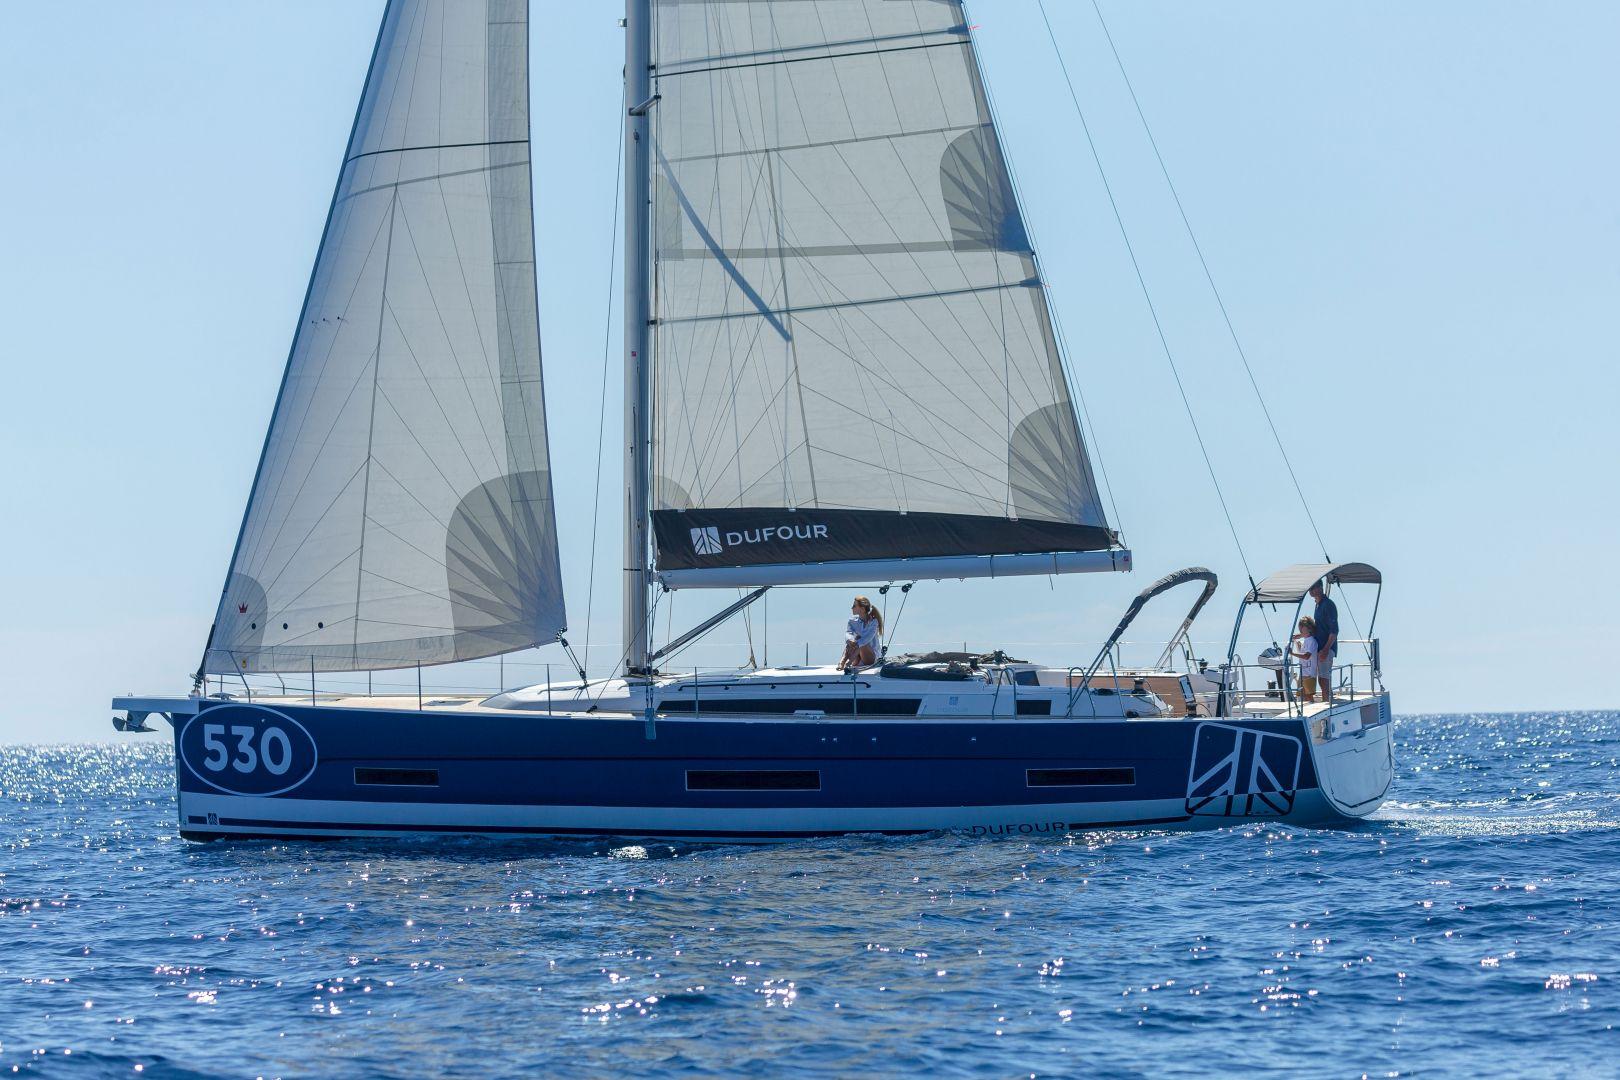 Dufour 530 sailing